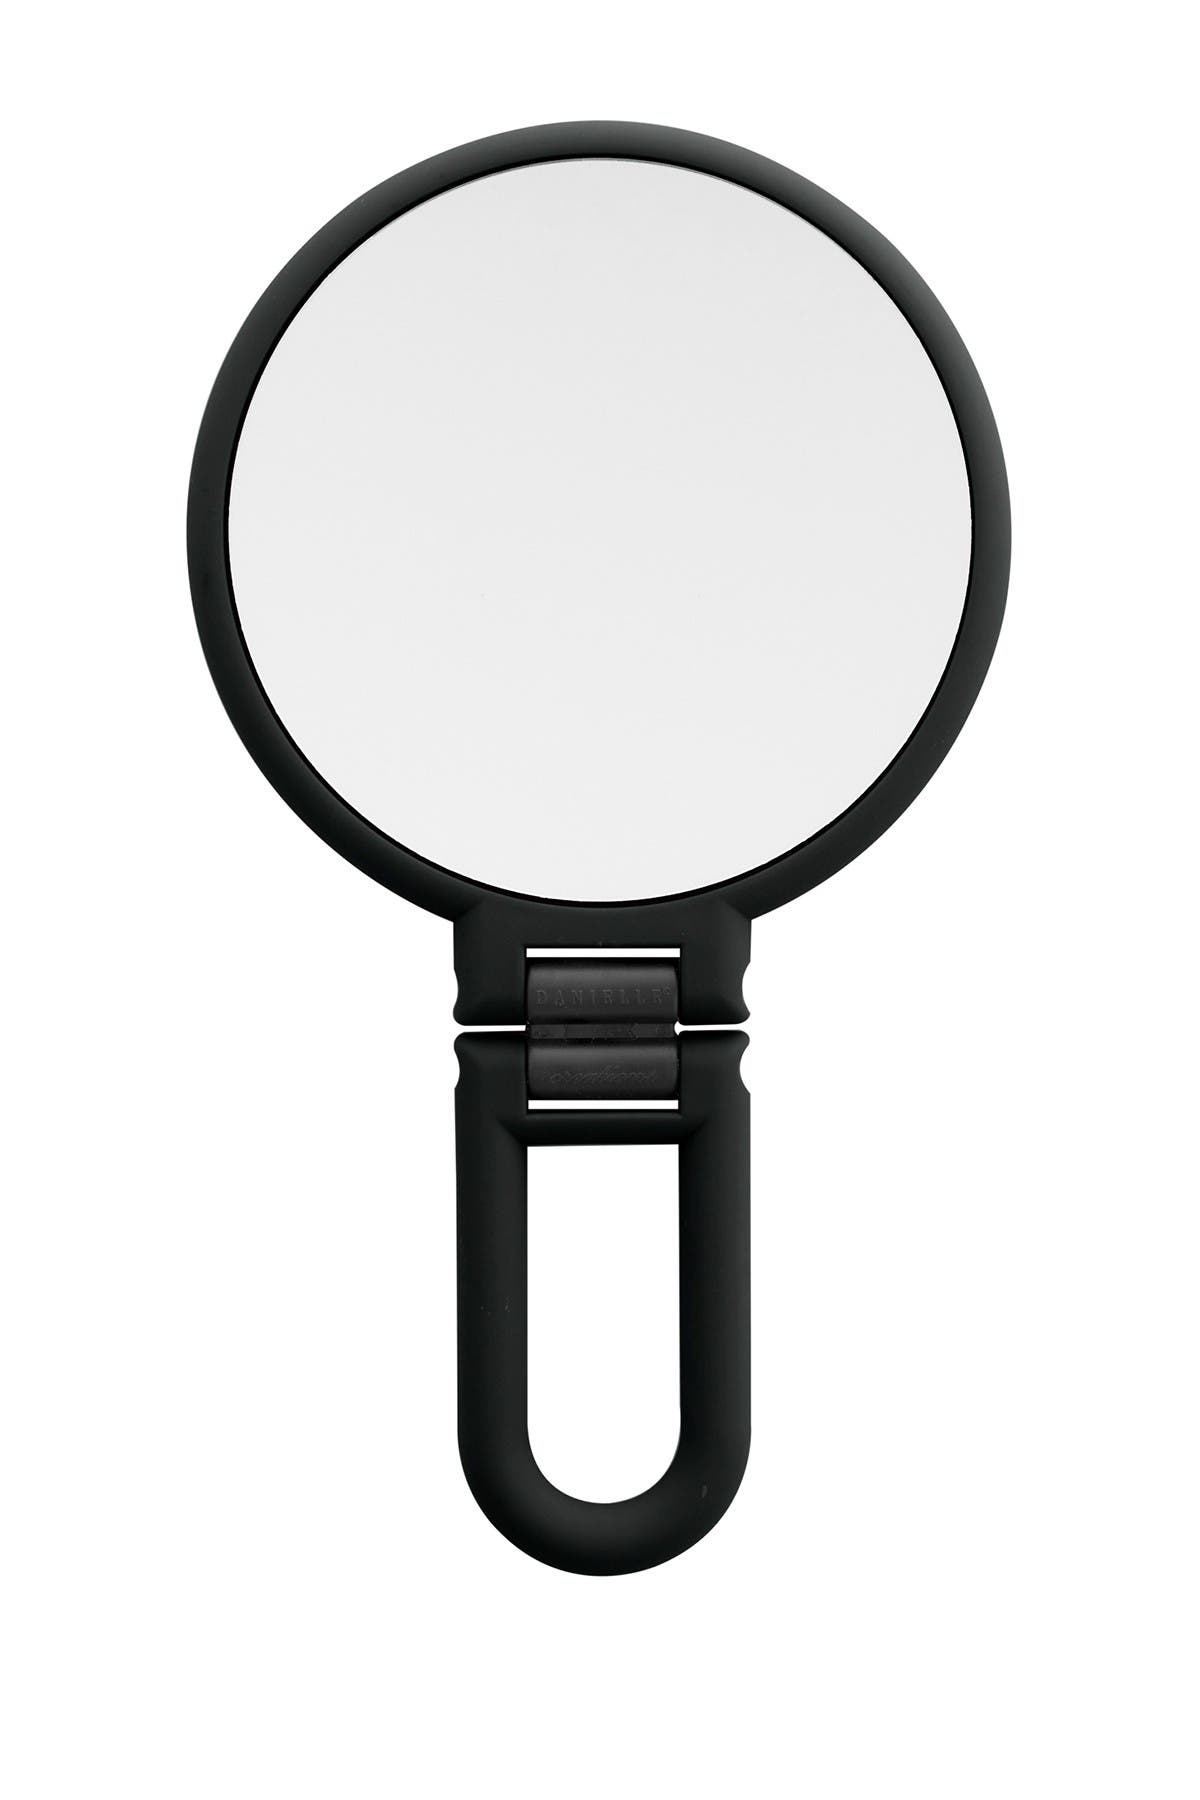 UPPER CANADA SOAPS Danielle Matte Hand Held Foldable Mirror - Black